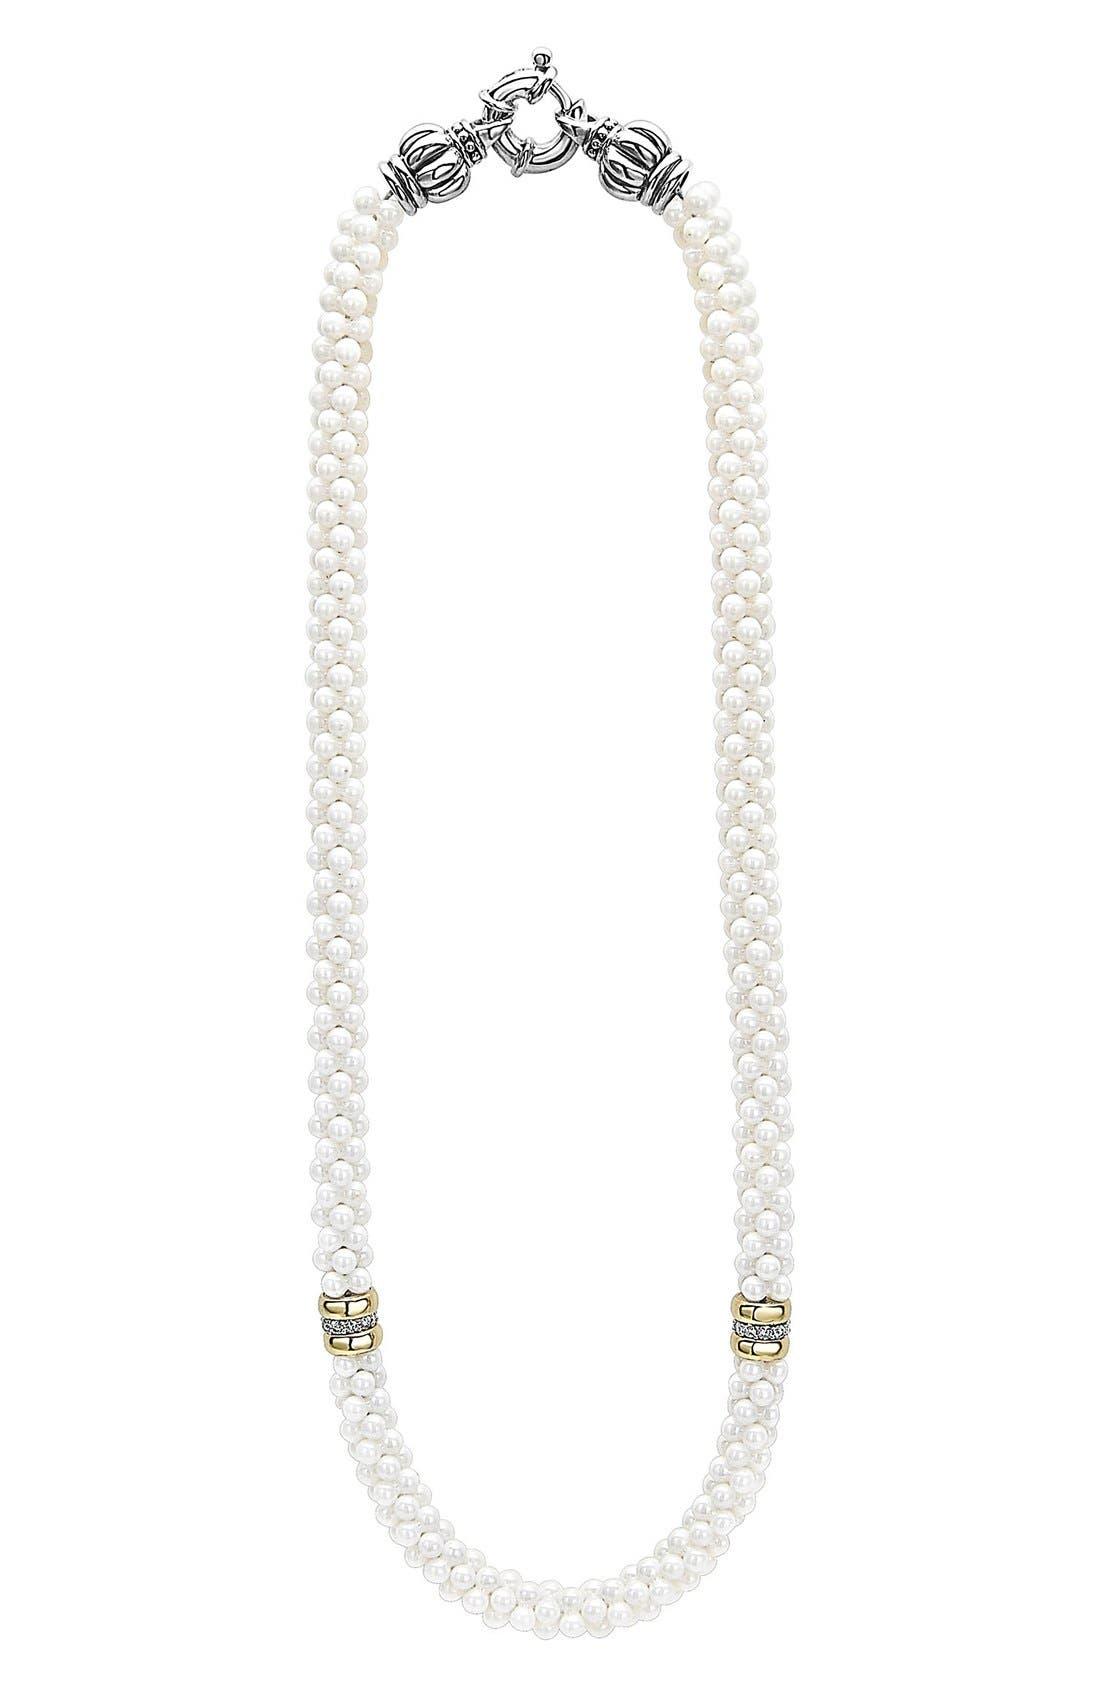 Alternate Image 1 Selected - LAGOS 'White Caviar' 7mm Beaded Diamond Station Necklace